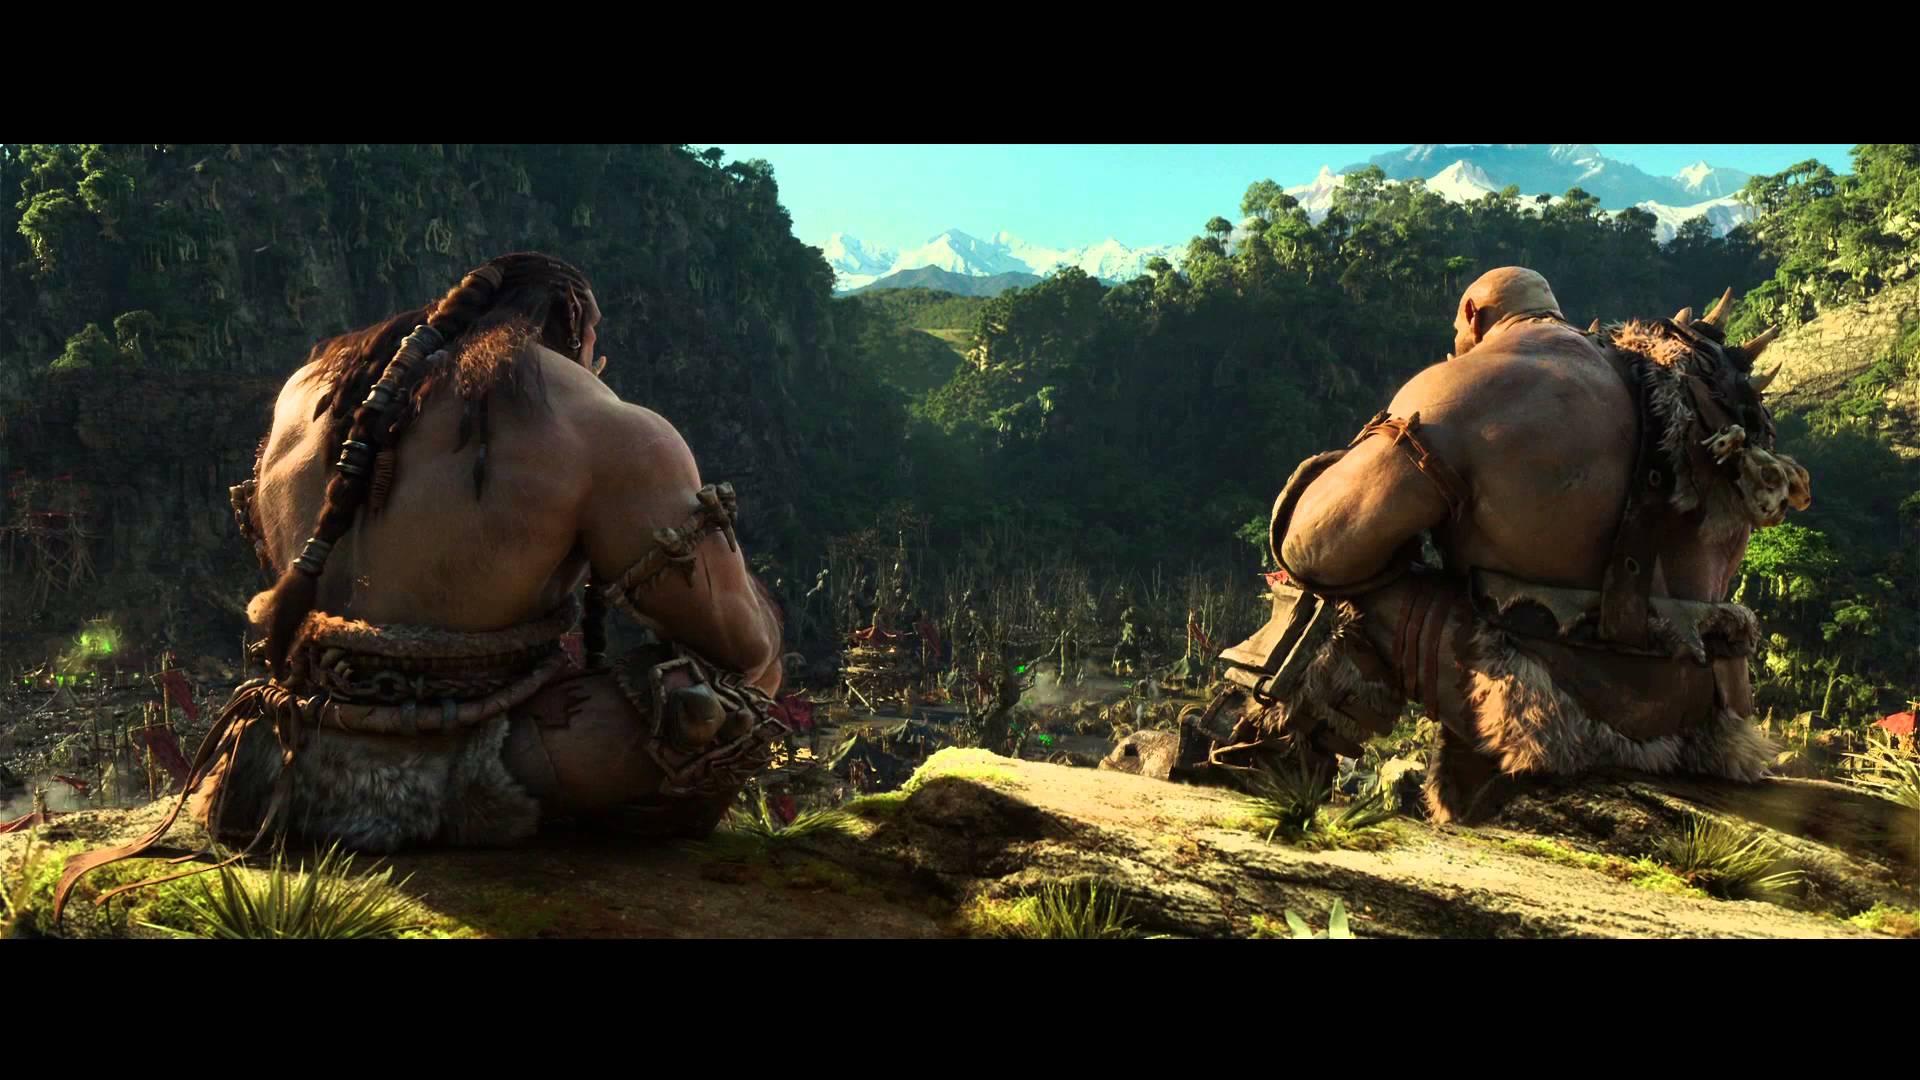 Warcraft: The Beginning – International Trailer (Universal Pictures)